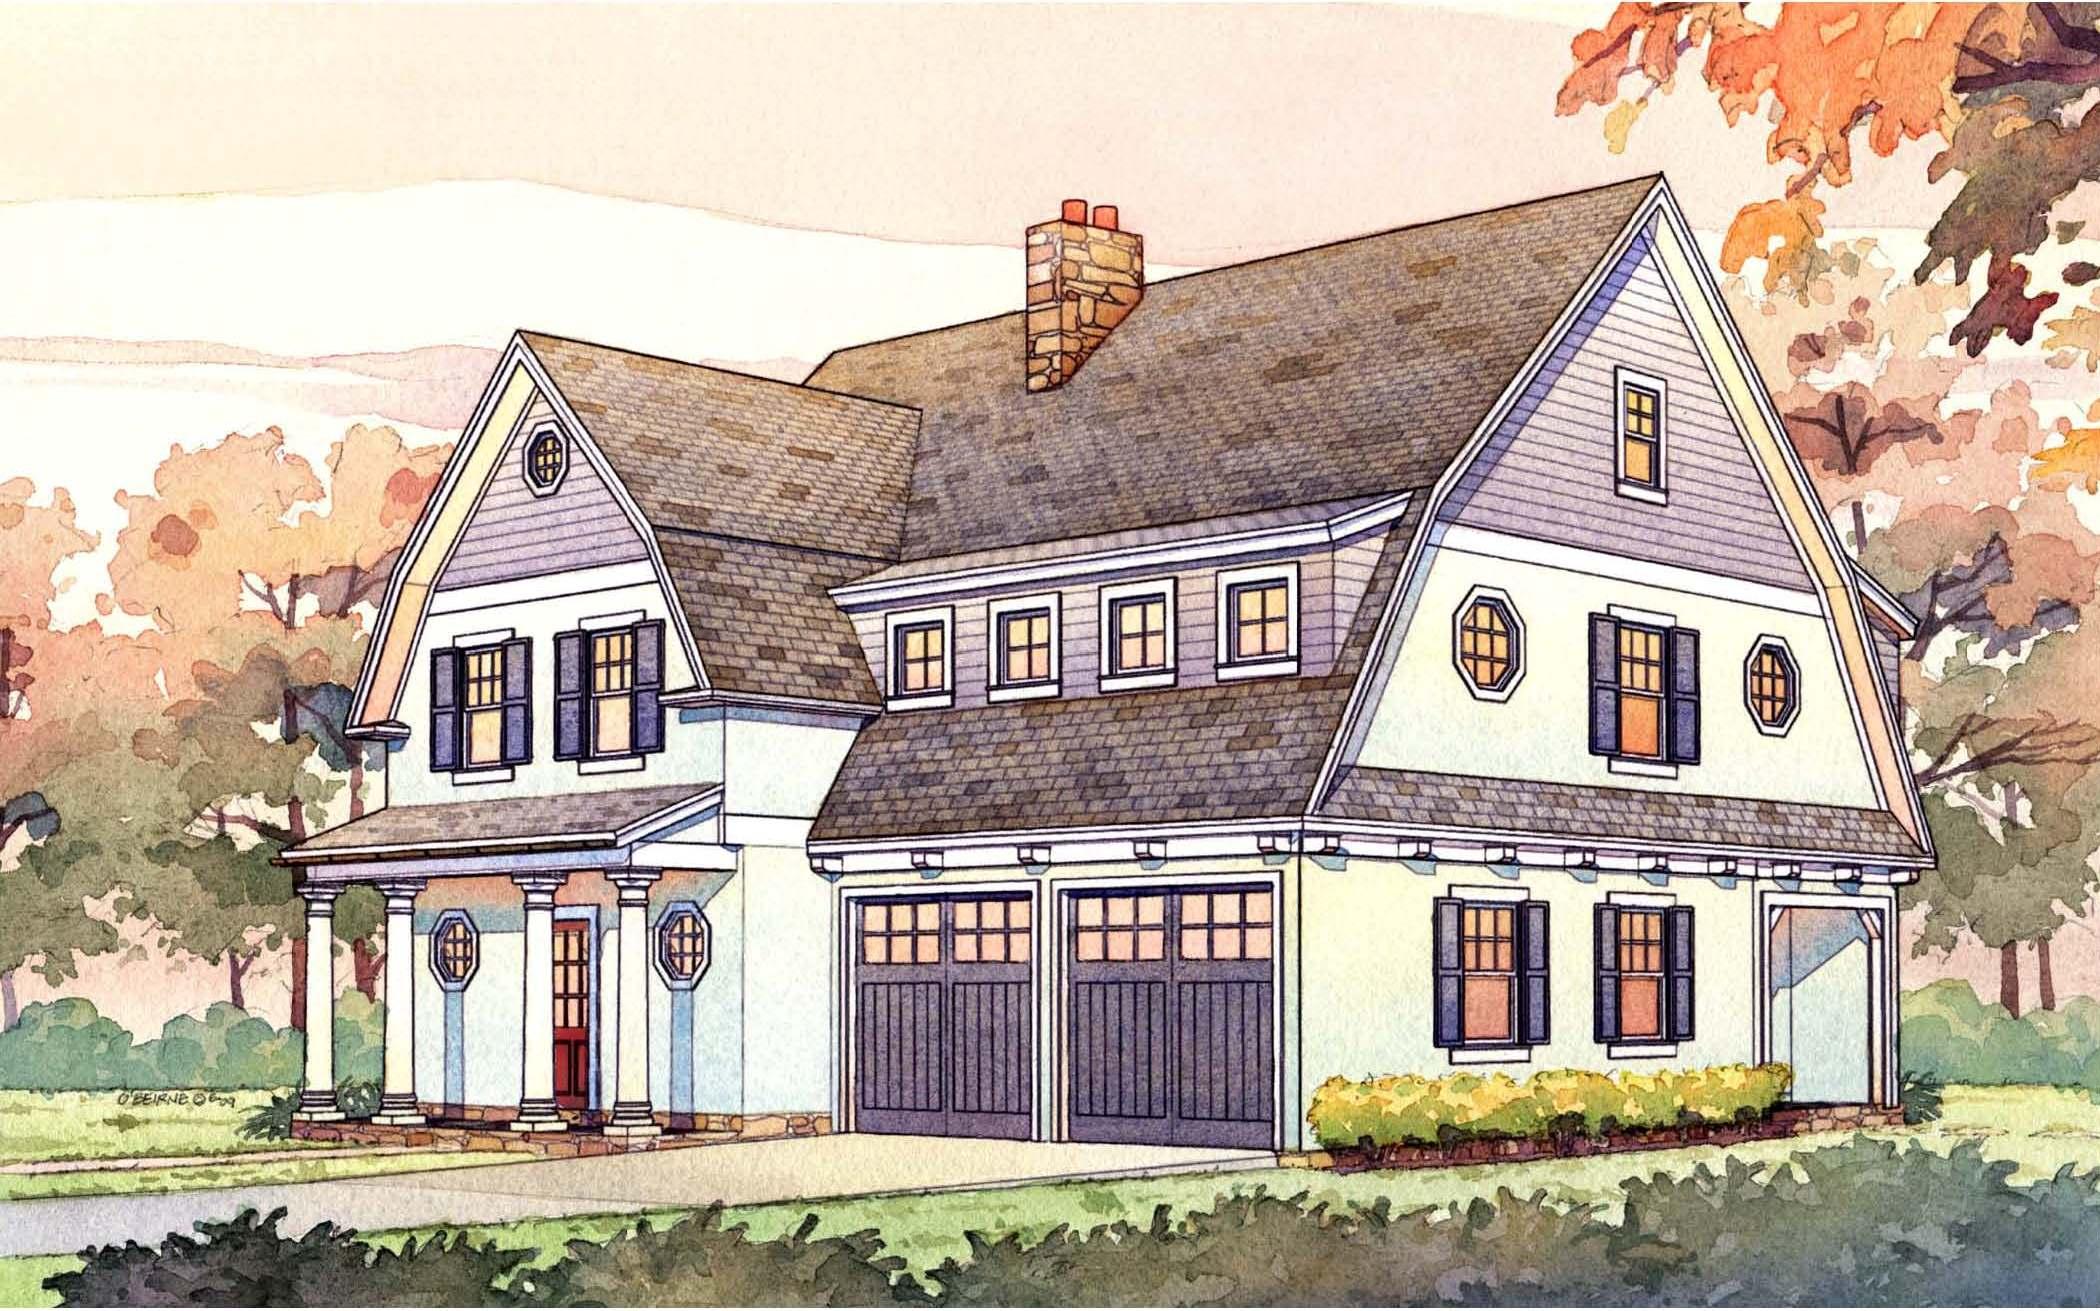 2 story passive solar gambrel house plan - 16503ar | architectural